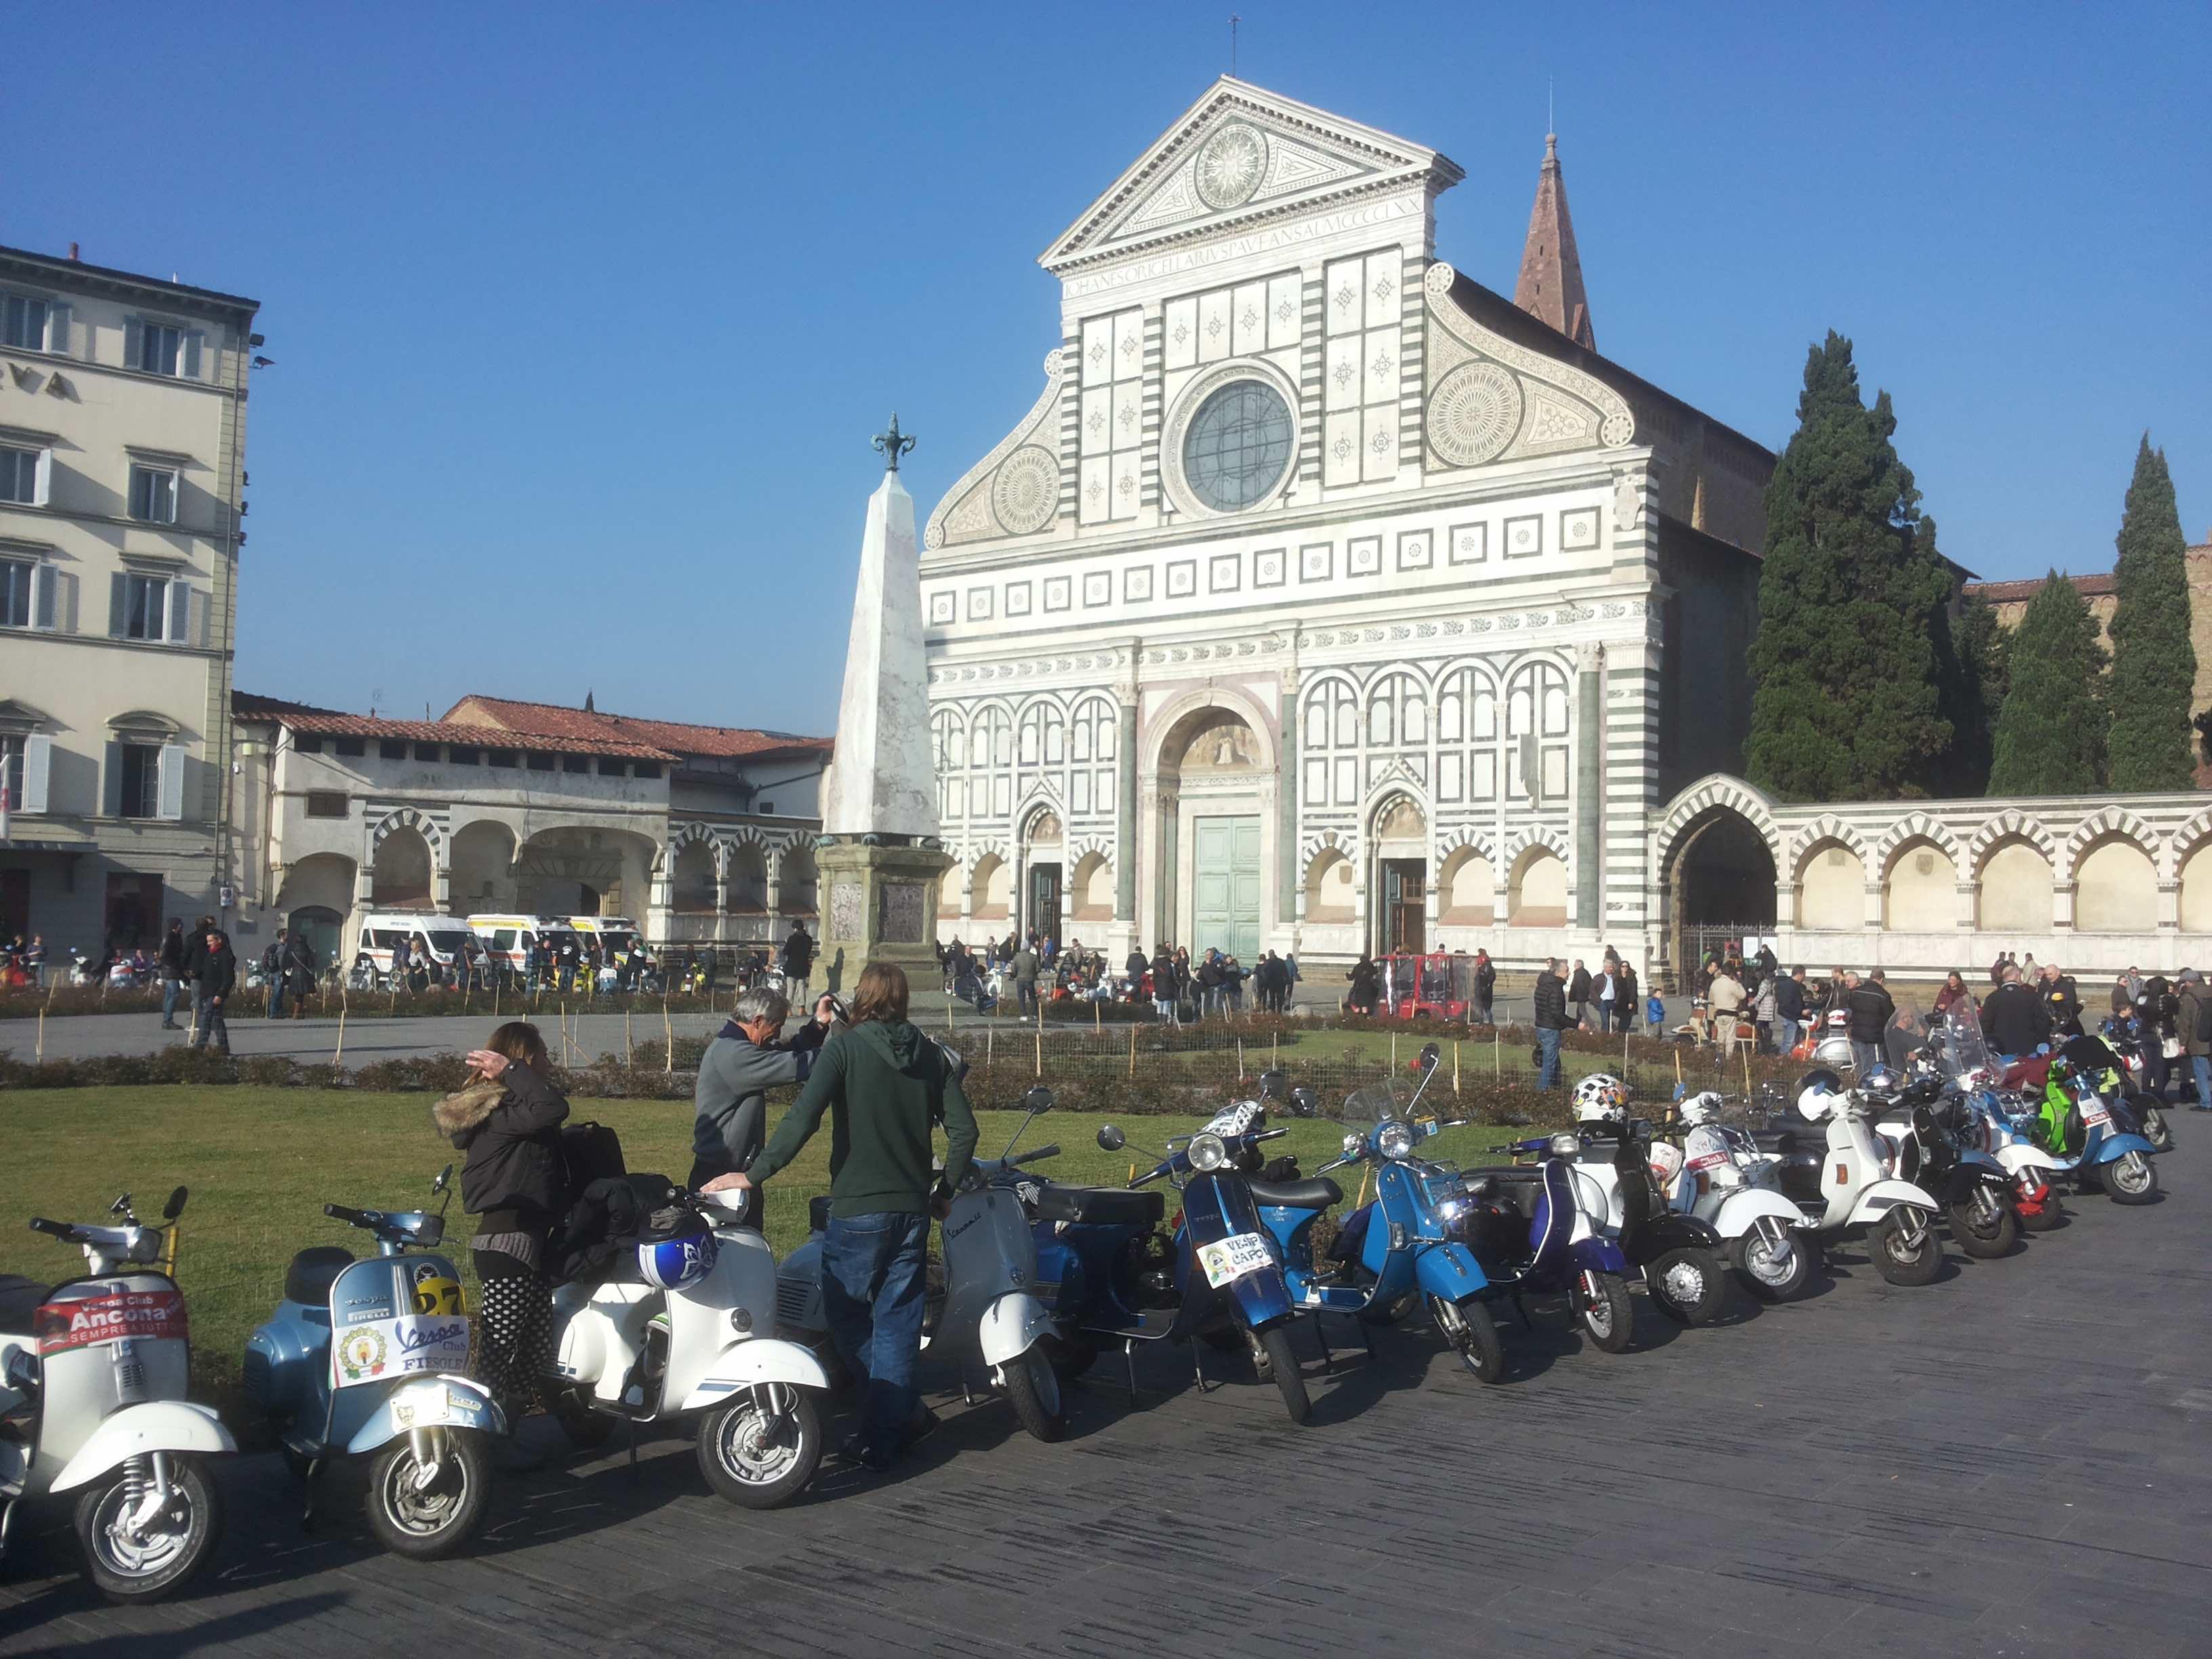 20150104_Firenze_Piazza_S.Maria_Novella 1